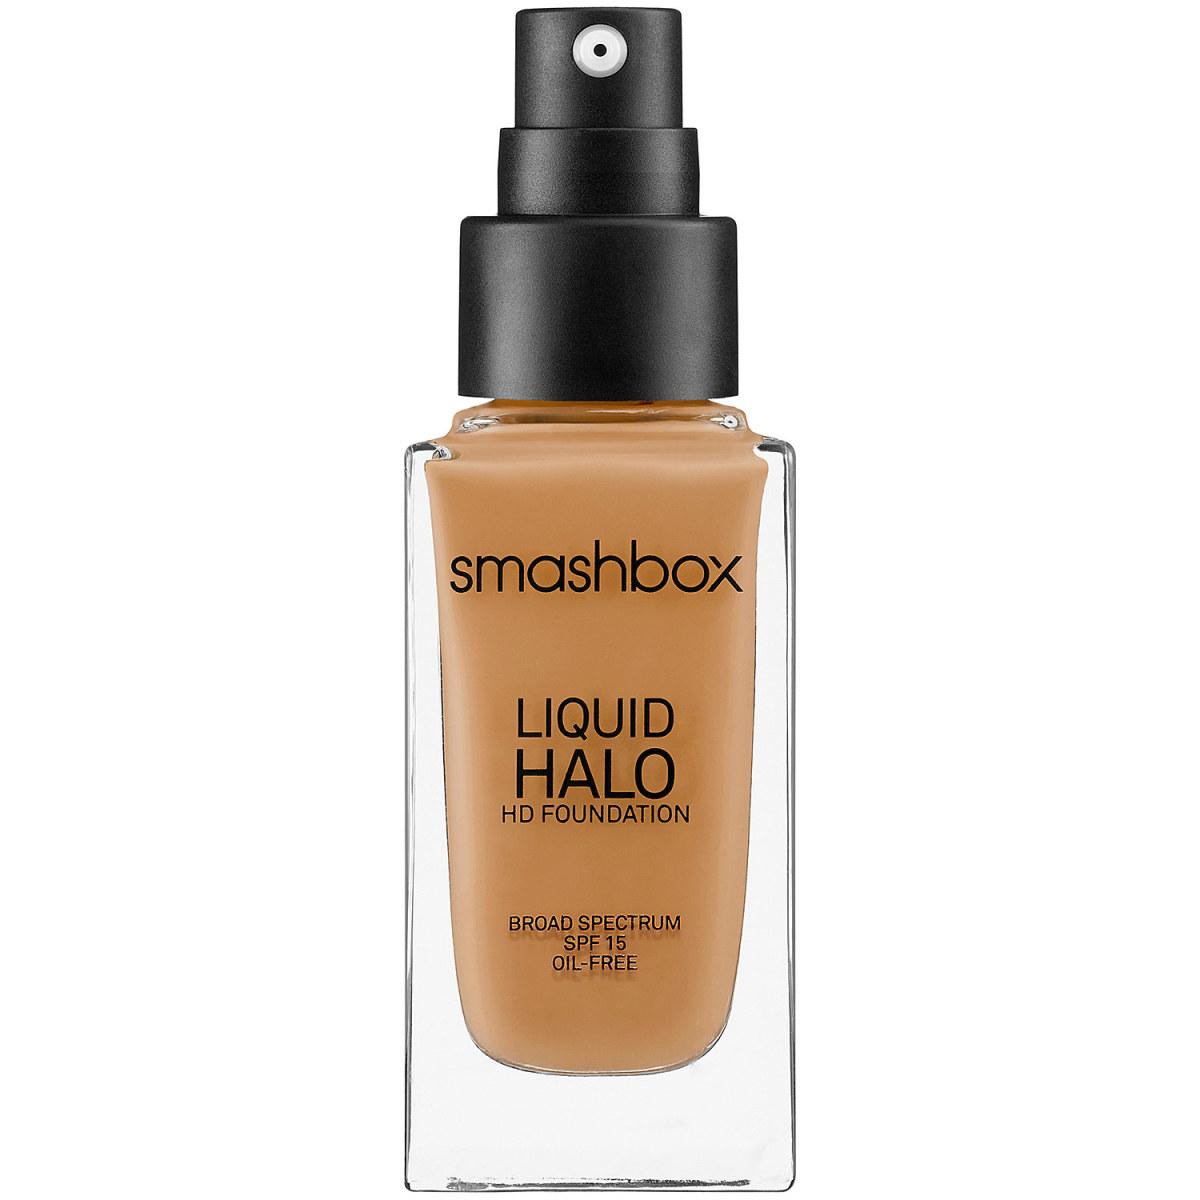 Smashbox Liquid Halo Foundation